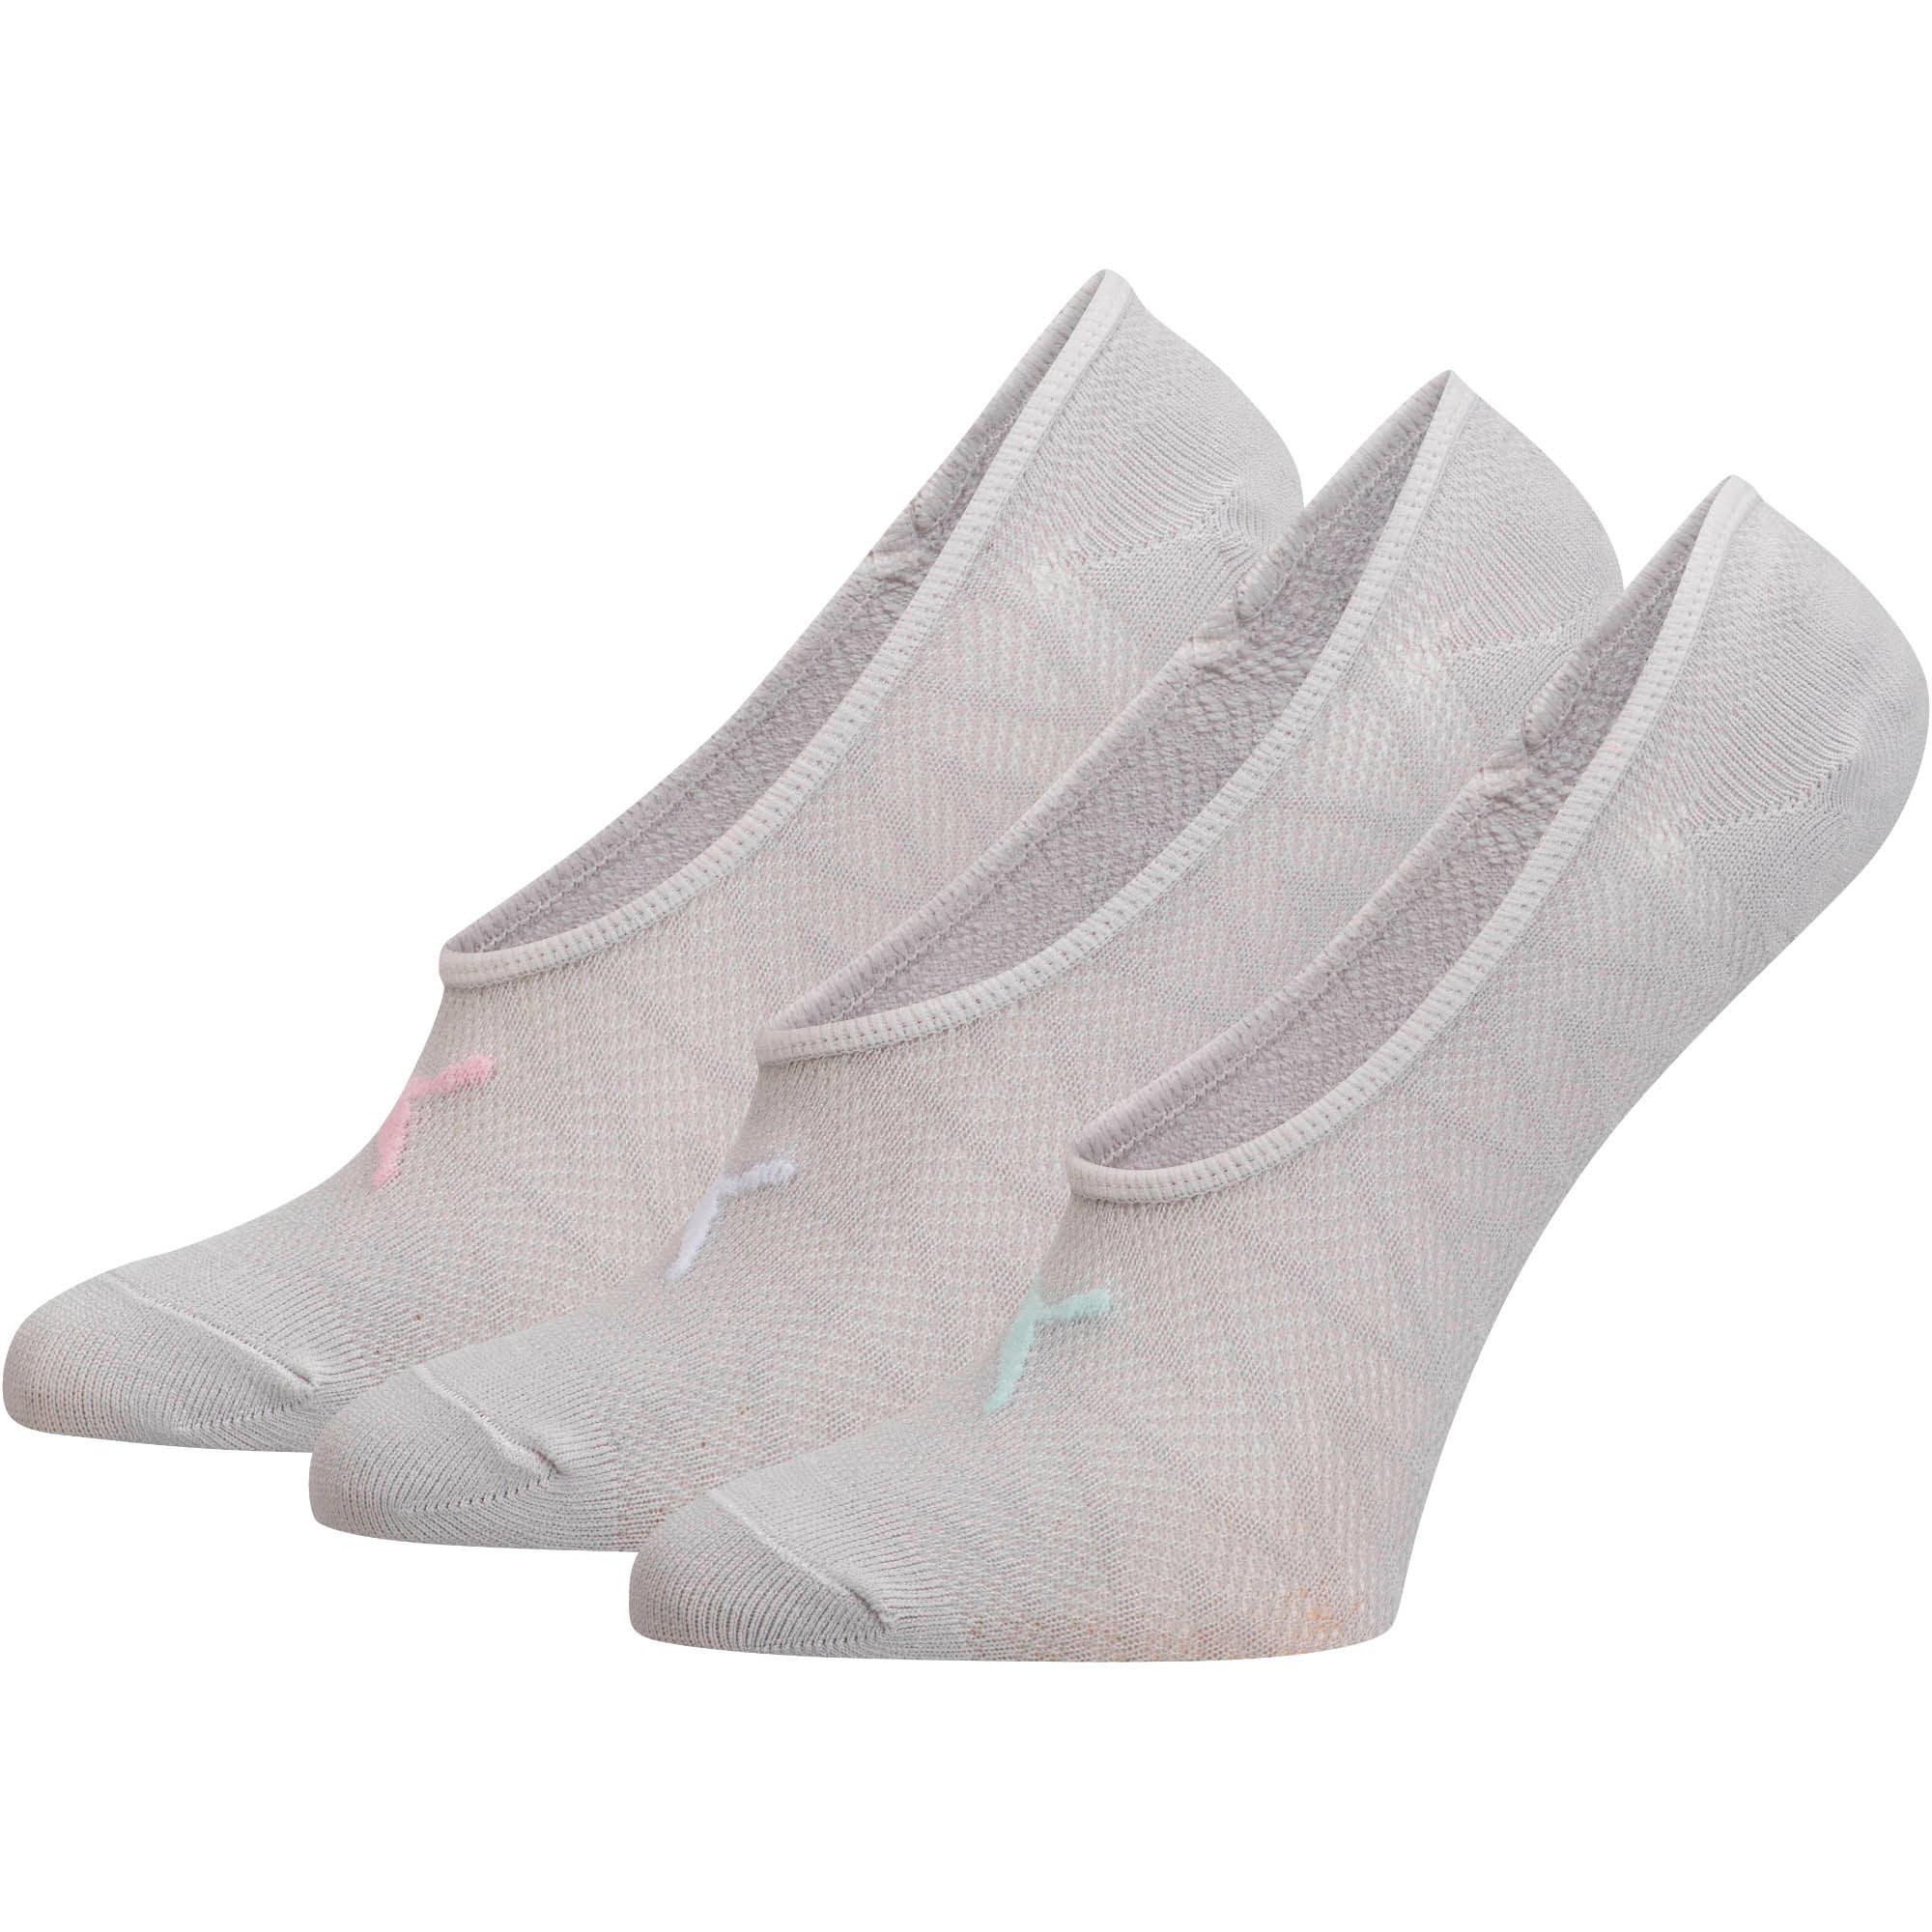 Thumbnail 1 of Women's Liner Socks [3 Pack], GREY / PURPLE, medium